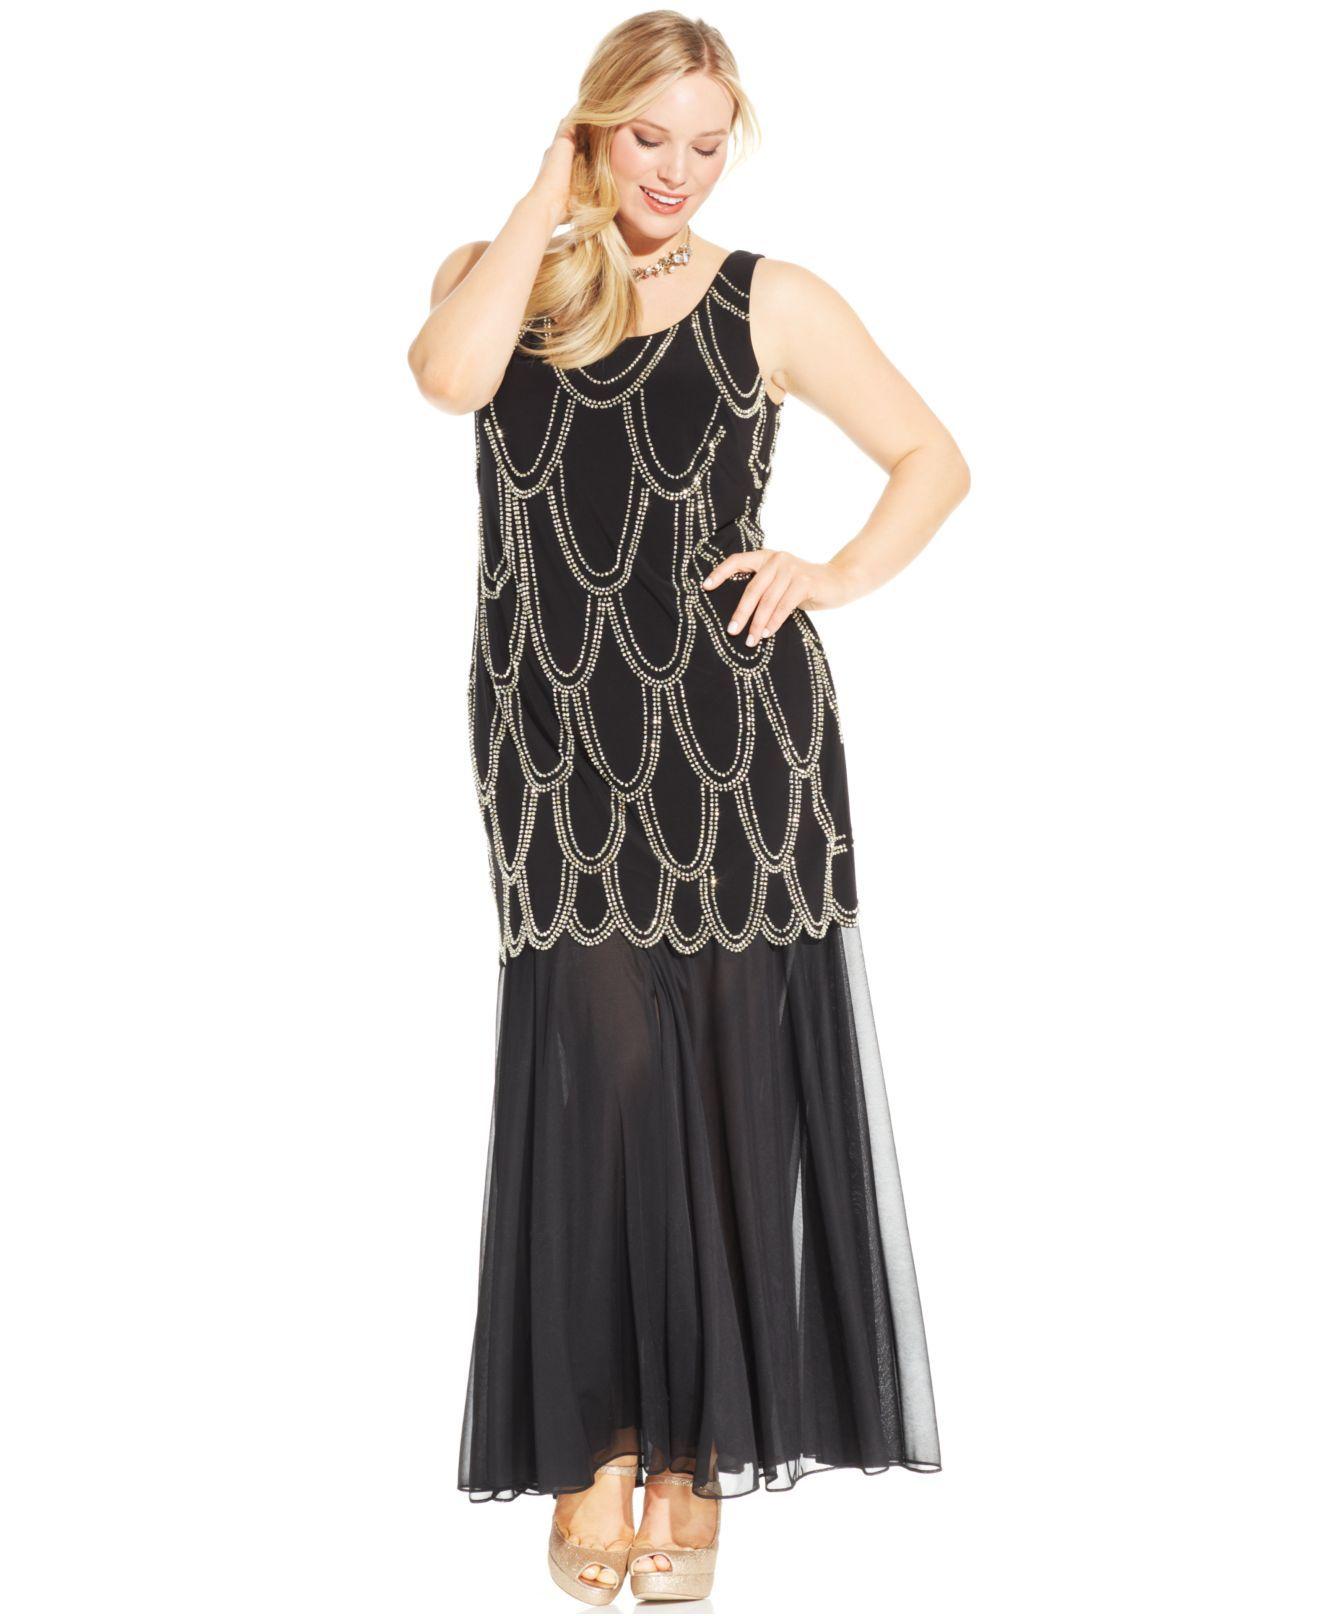 Roaring 20s dress plus size | Color dress | Pinterest | Roaring ...